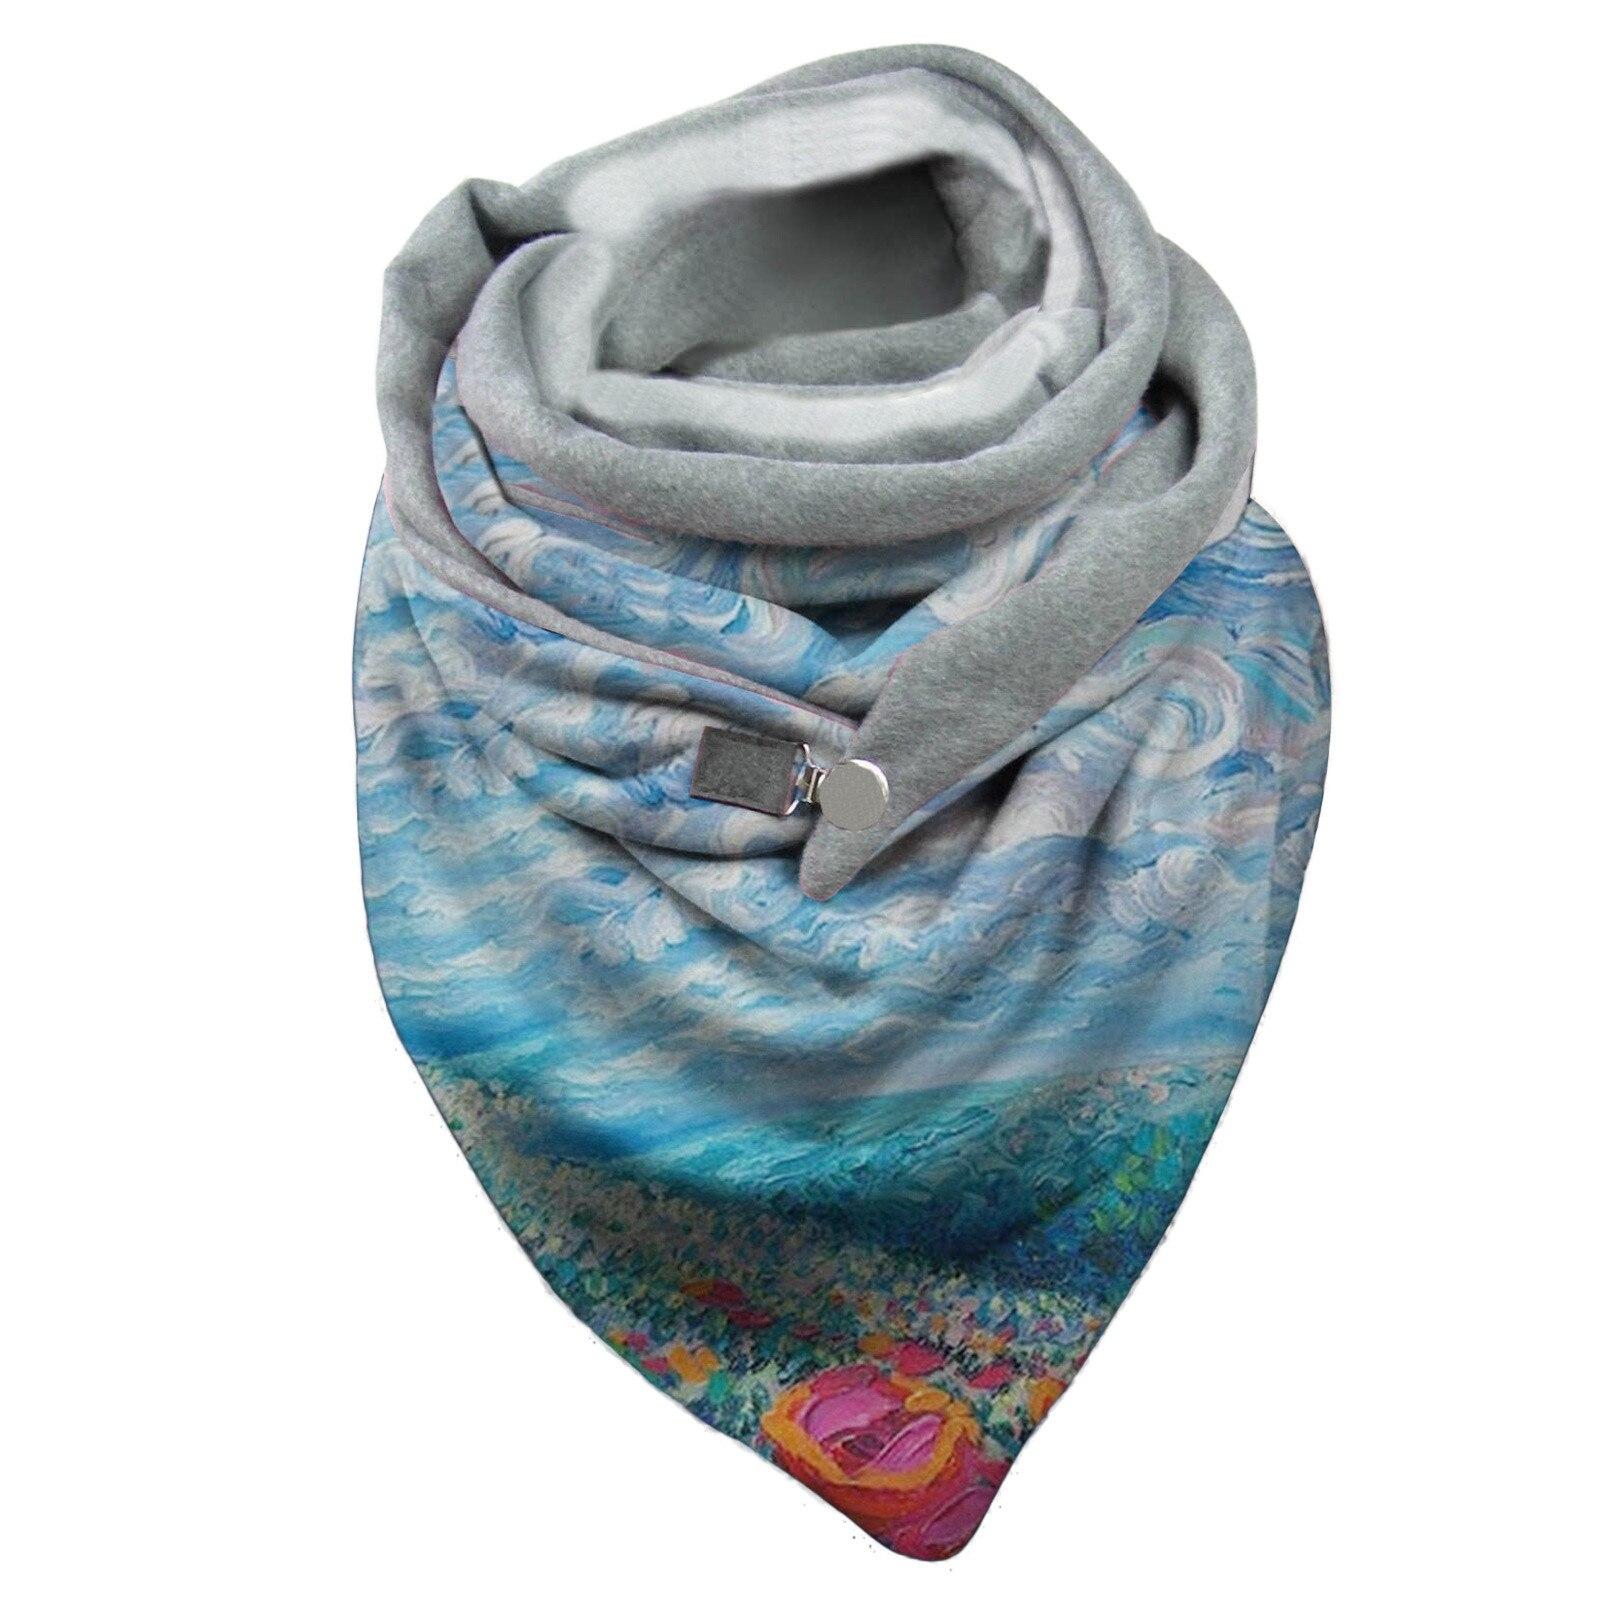 2021 платок женский Fashion Winter Abstract Print Bib Scarf плед echarpe femme Women's Buckle Imitation Cashmere бандана шарф